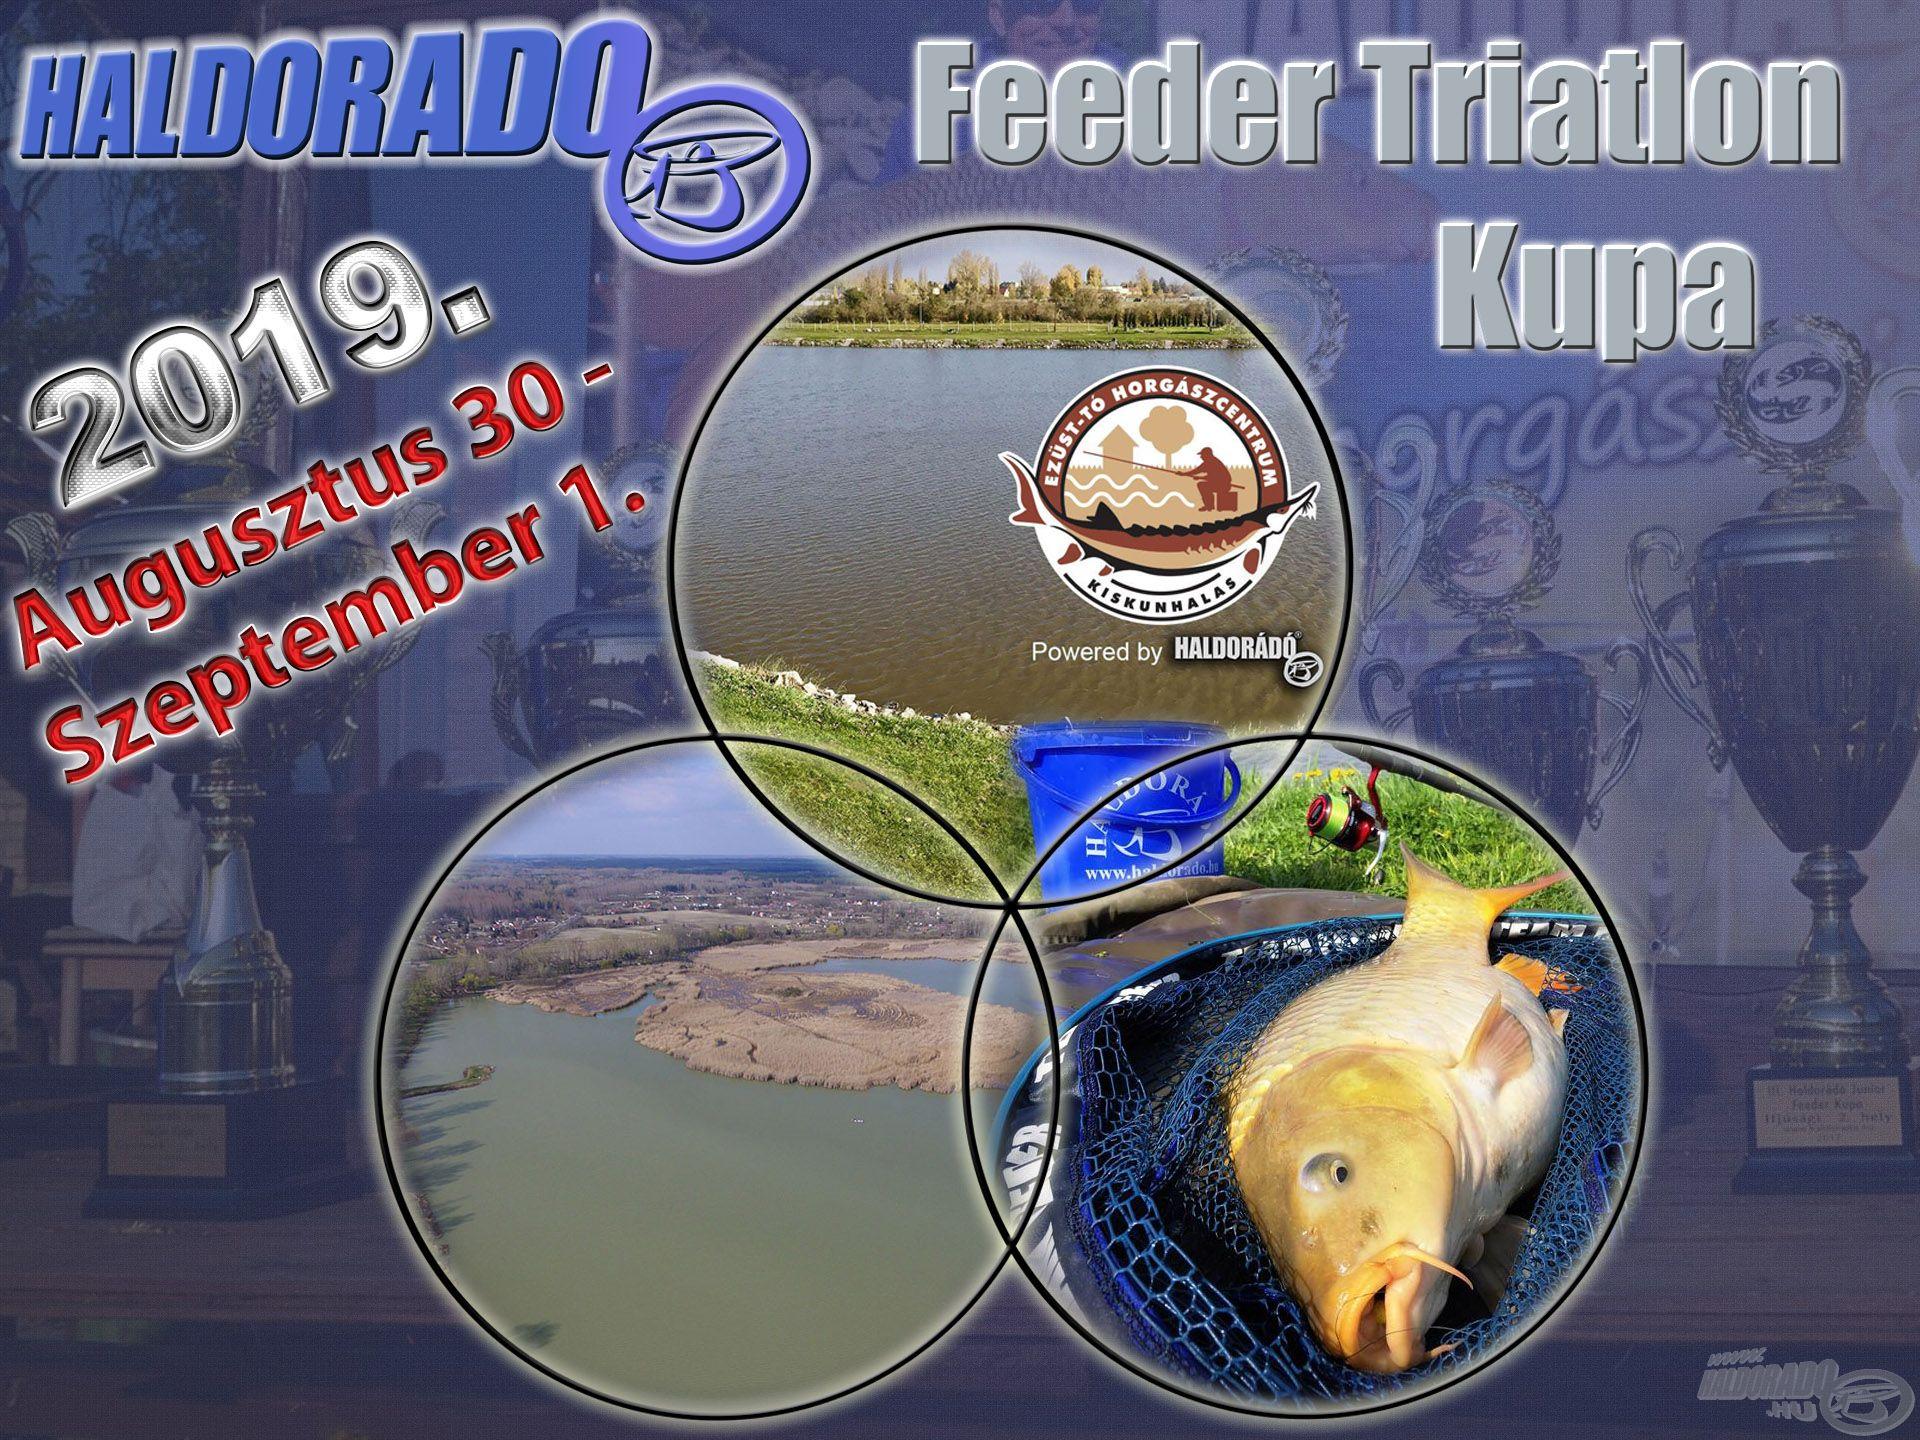 Haldorádó Feeder Triatlon Kupa versenykiírás - 2019